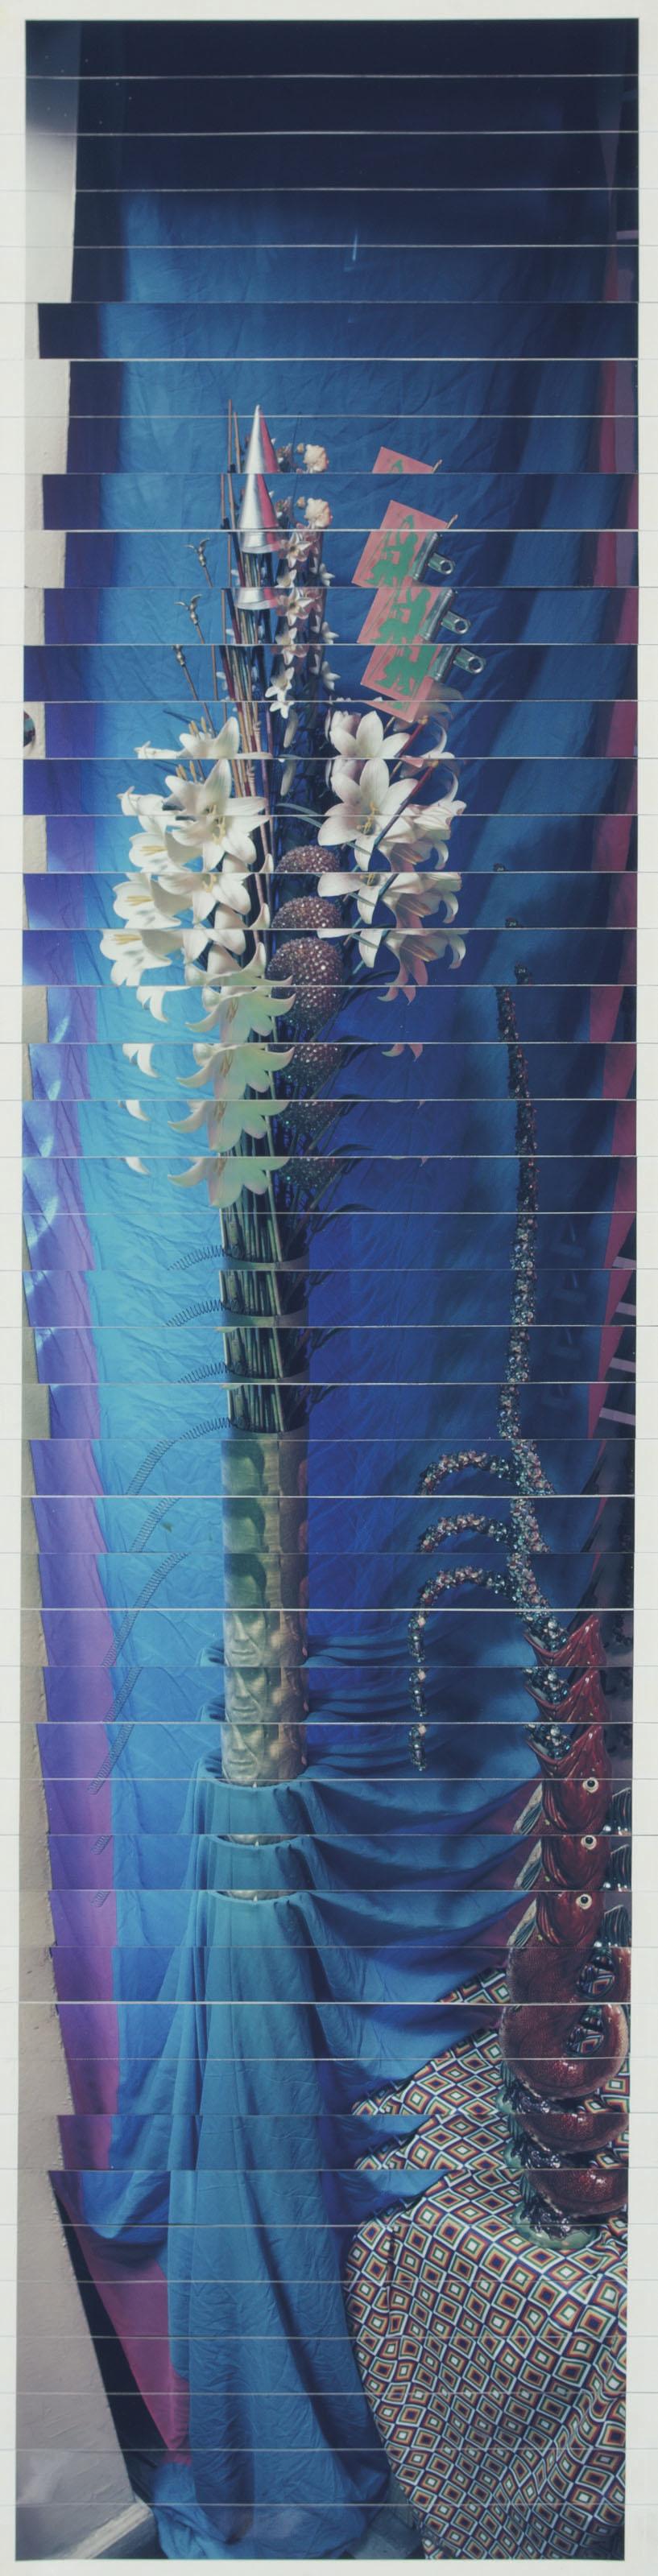 Lilies Still Life, 1983